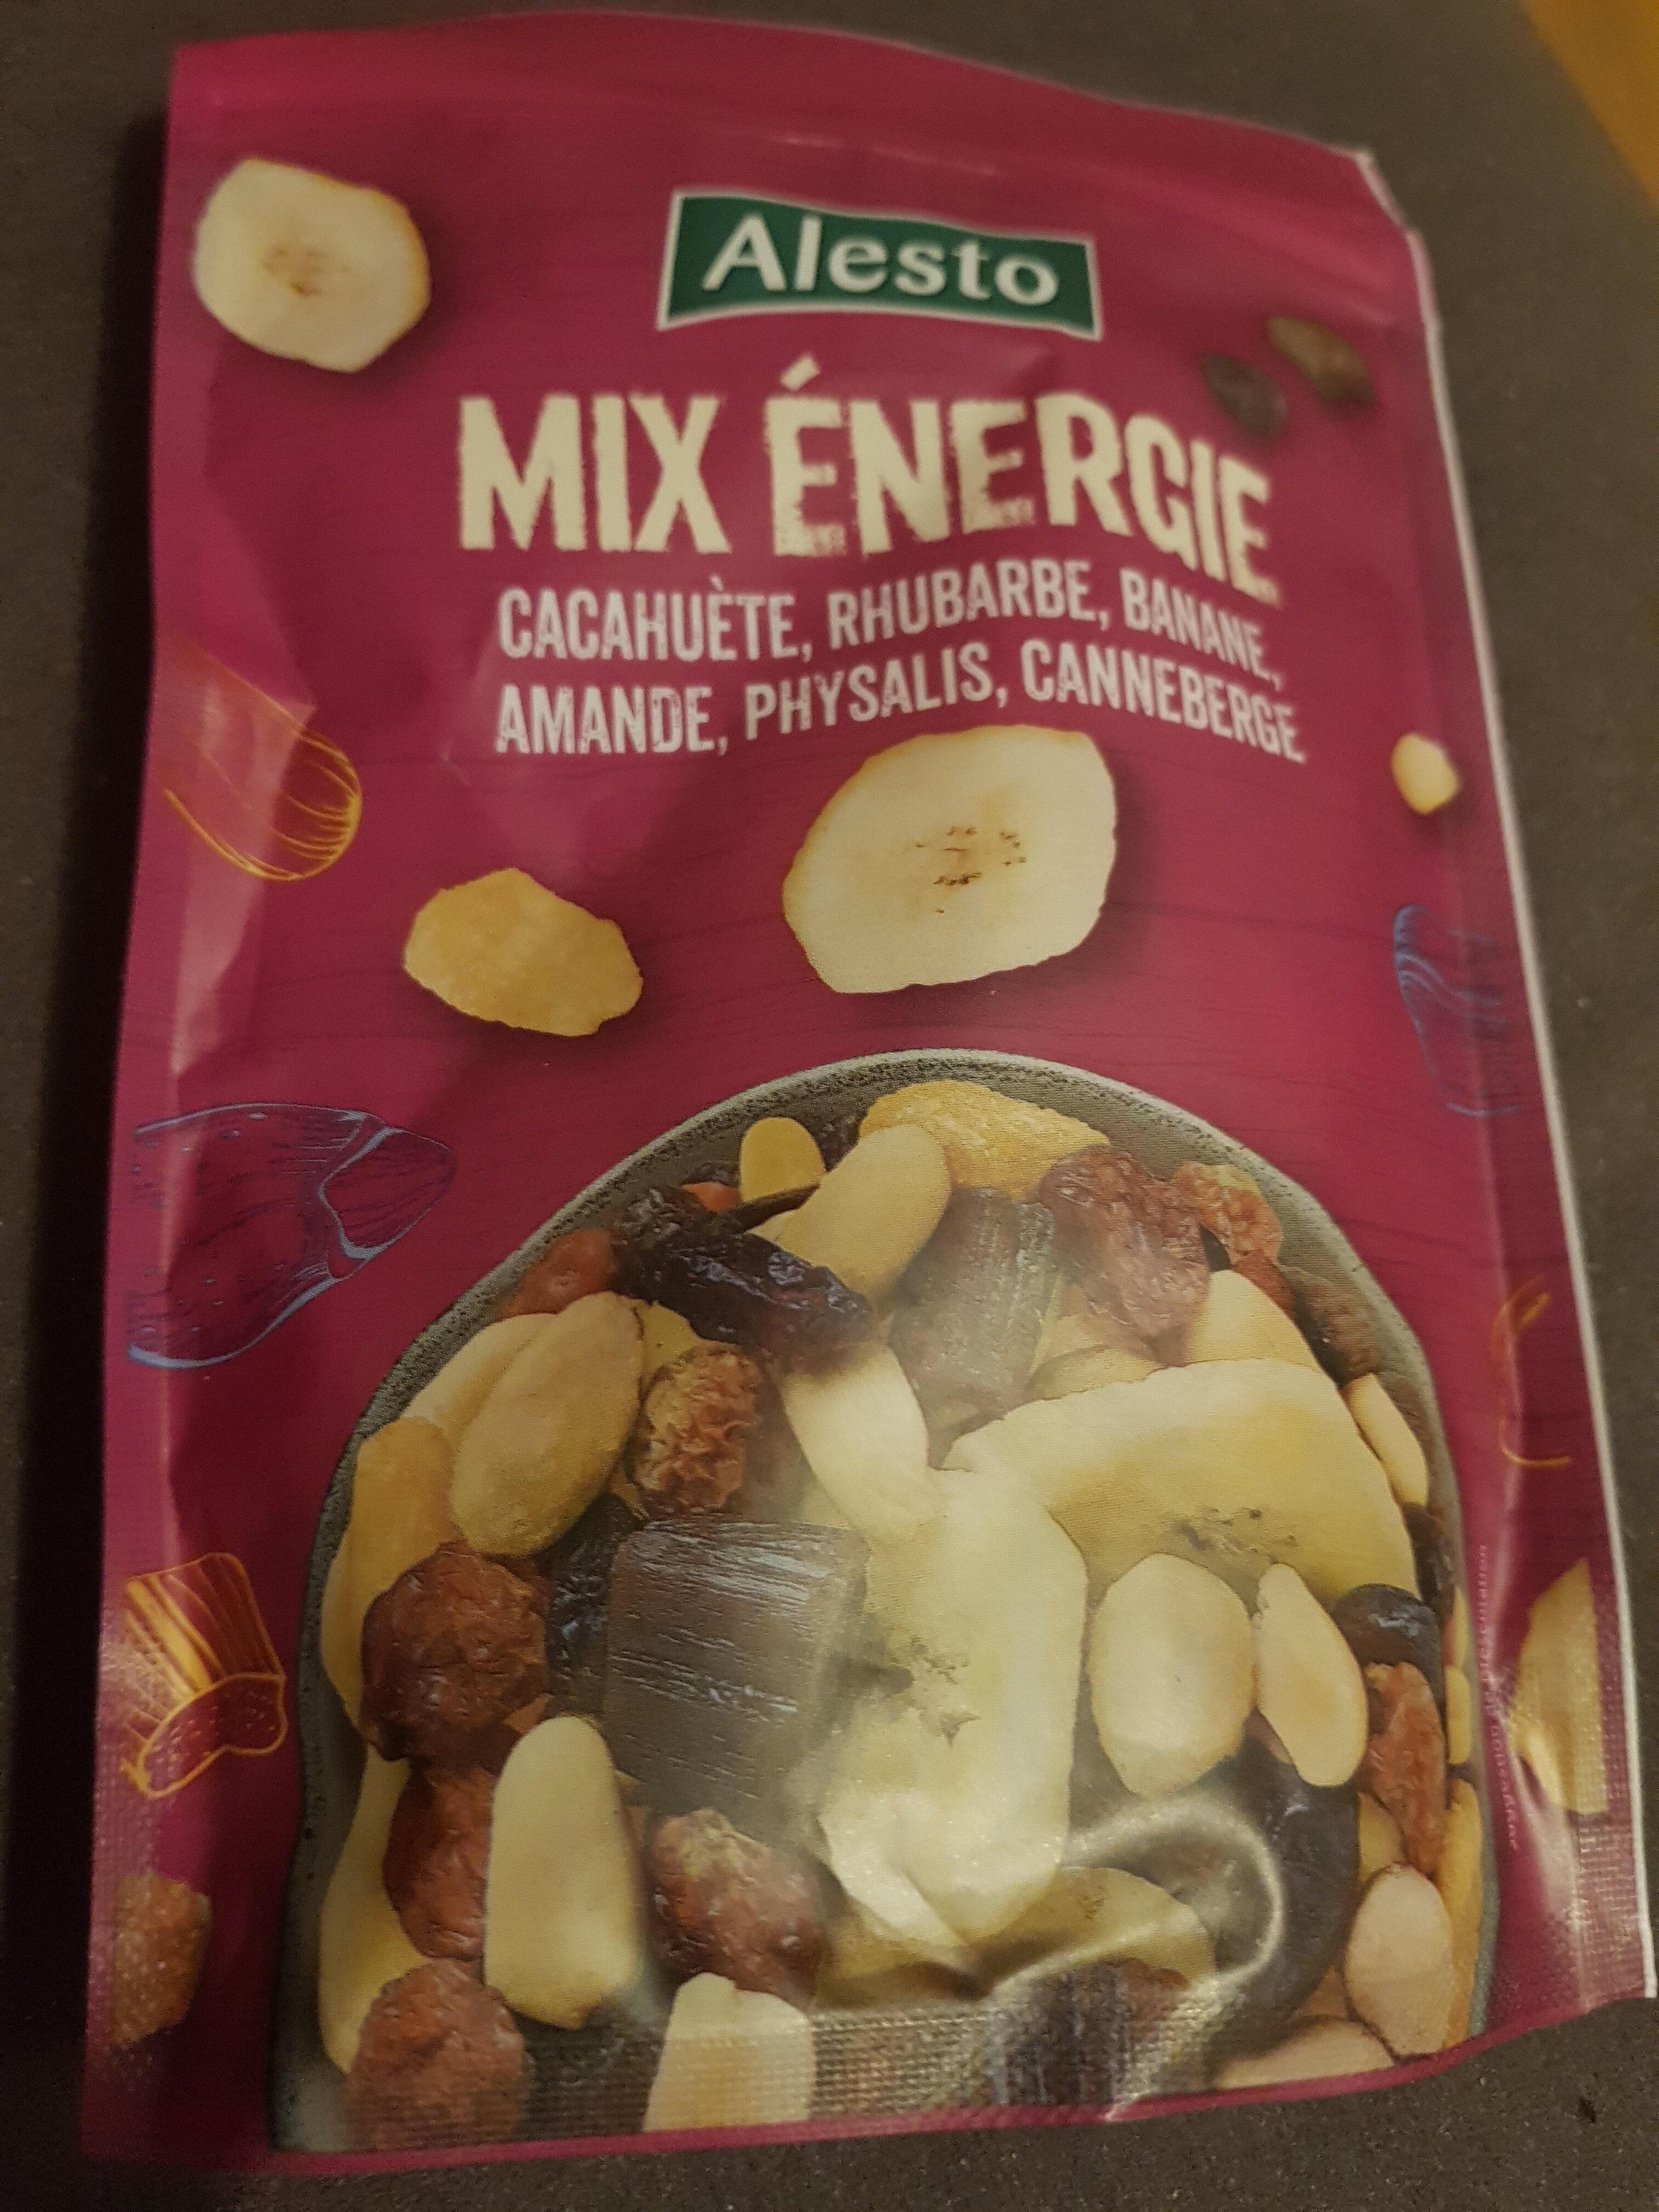 Mix énergie : cacahuète, rhubarbe, banane, amande, physalis, canneberge - Prodotto - fr